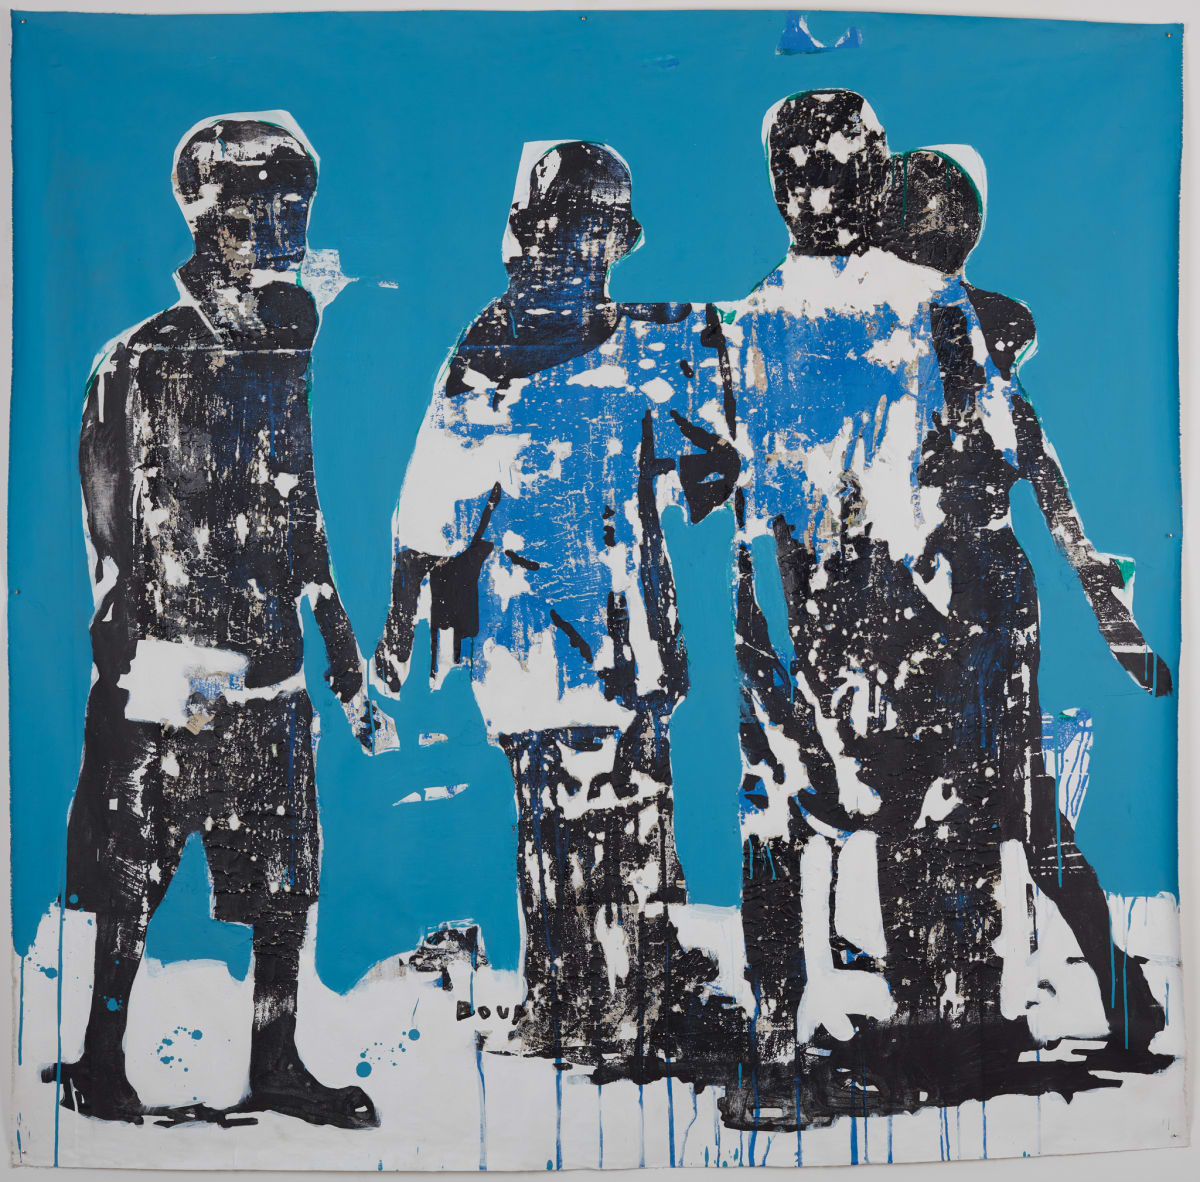 Armand Boua, Untitled, 2019